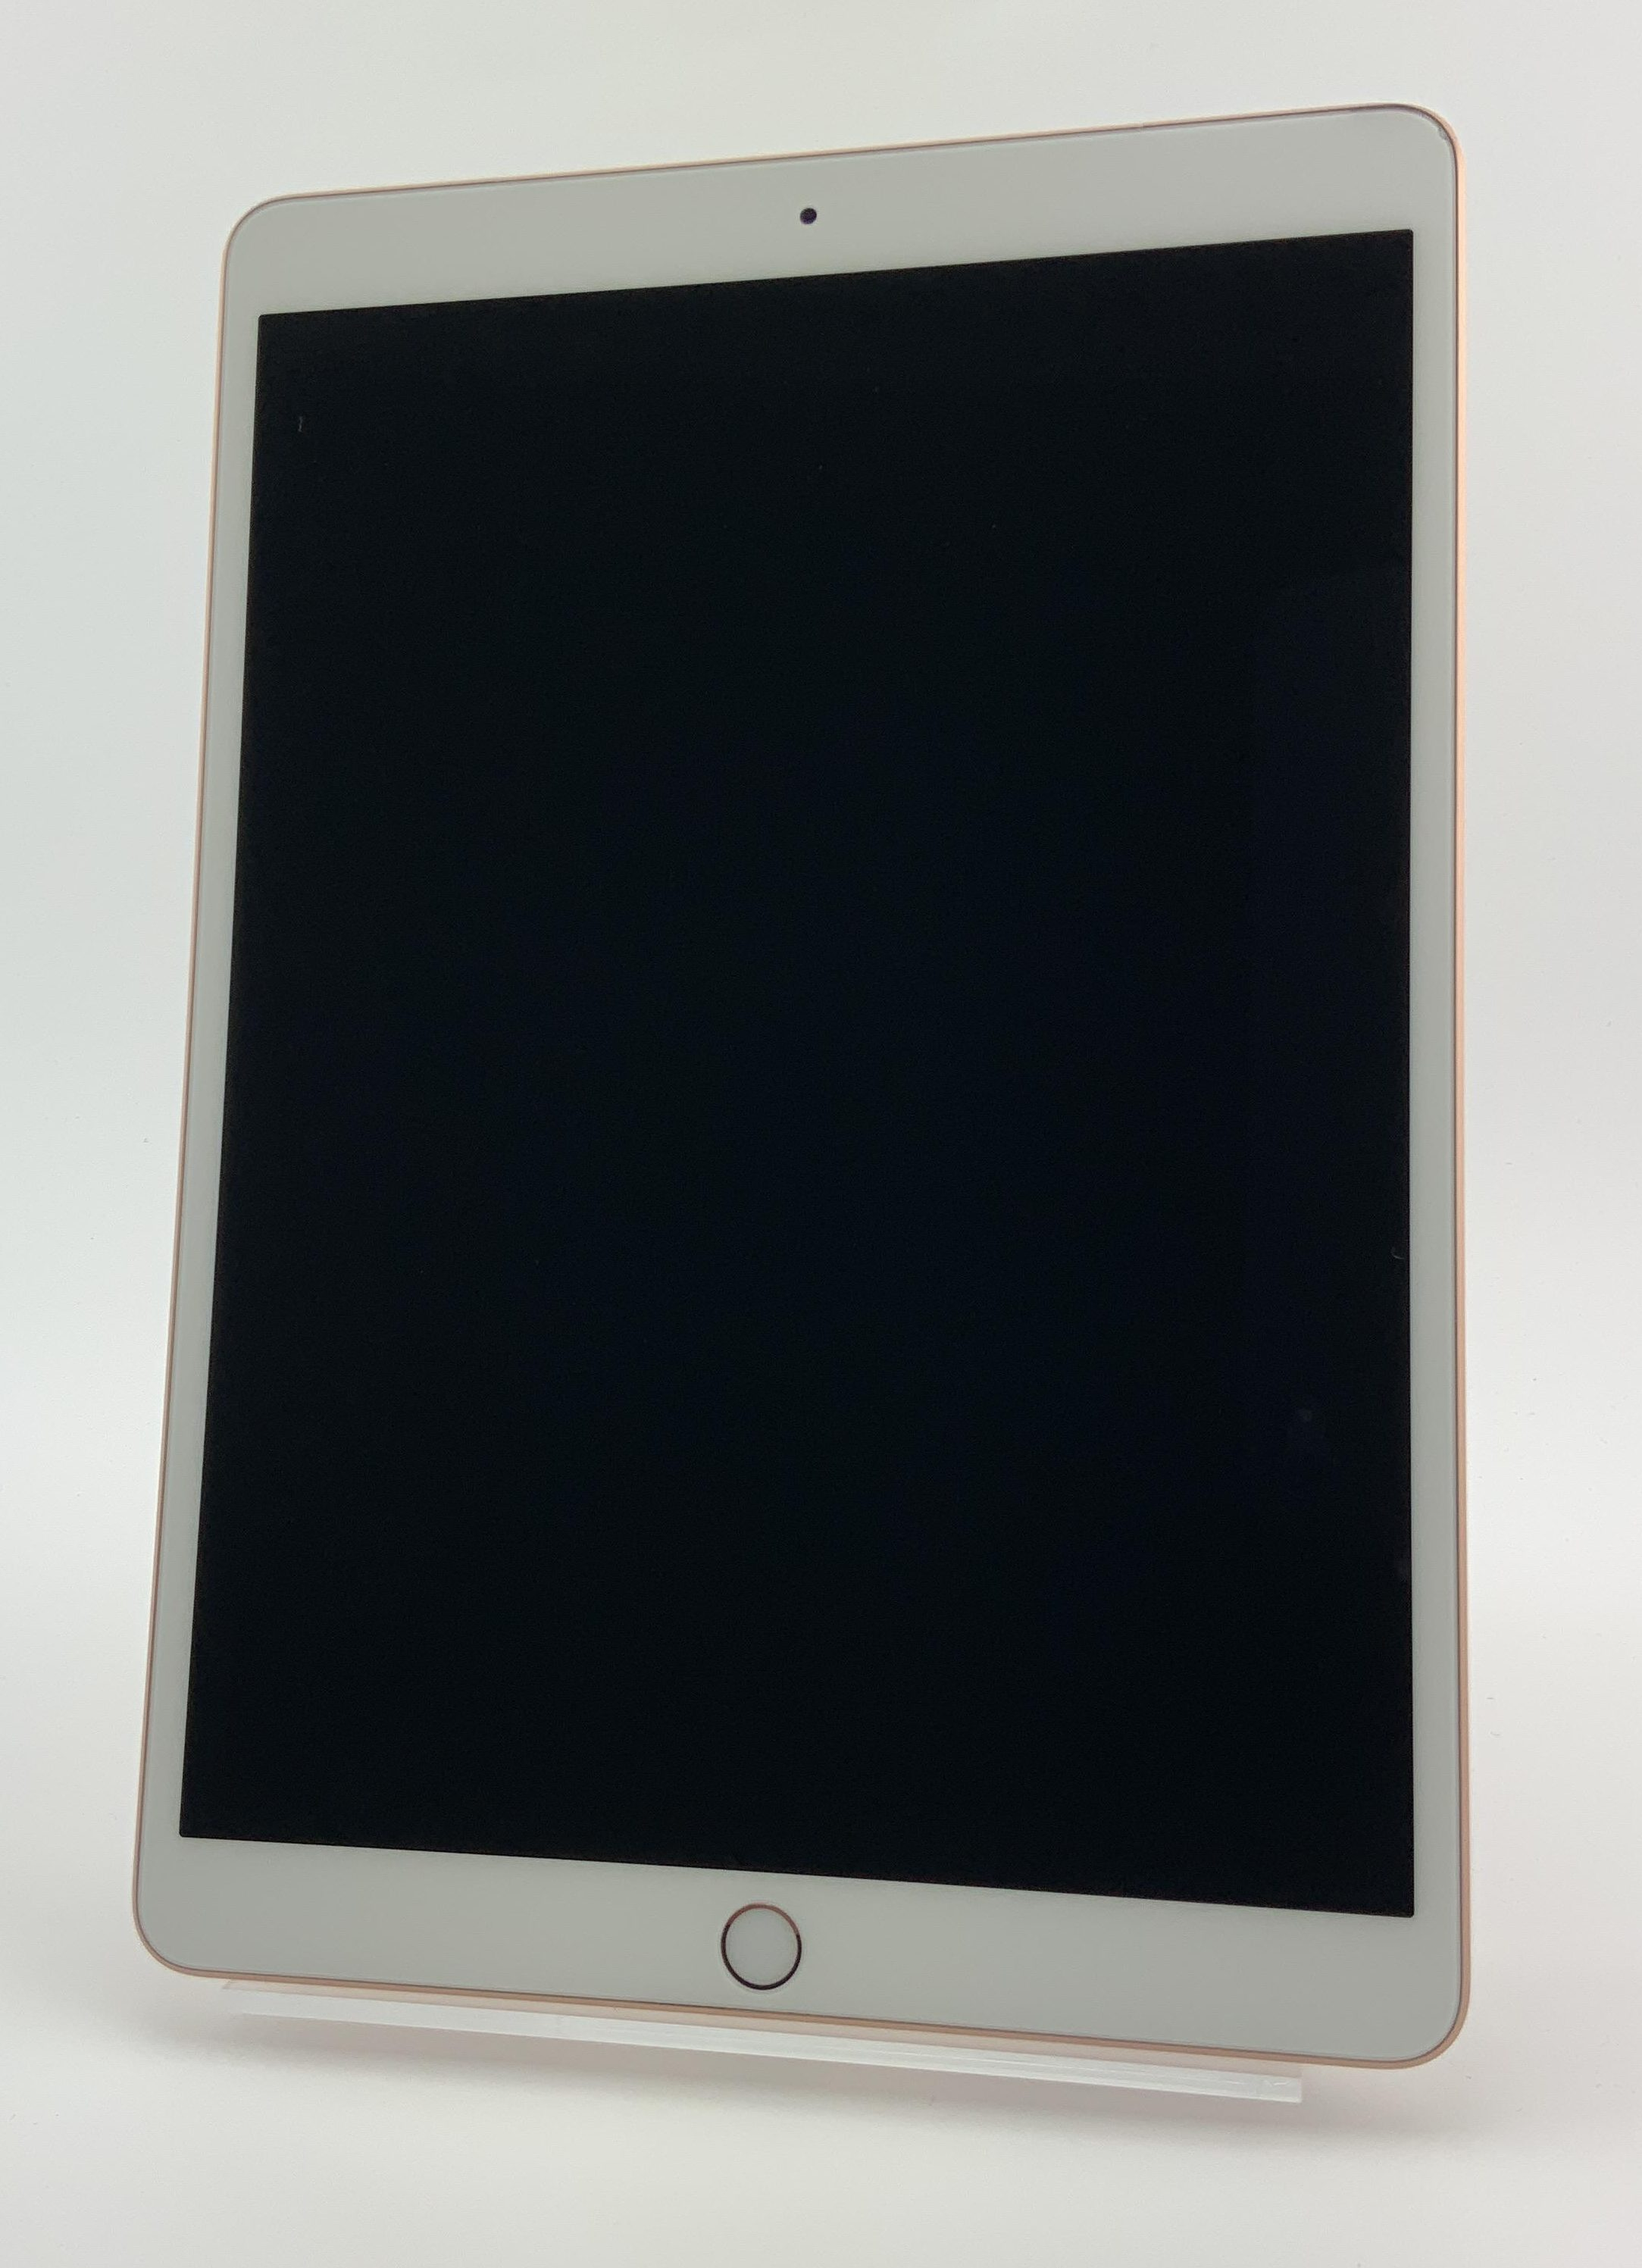 iPad Air 3 Wi-Fi + Cellular 256GB, 256GB, Gold, image 1